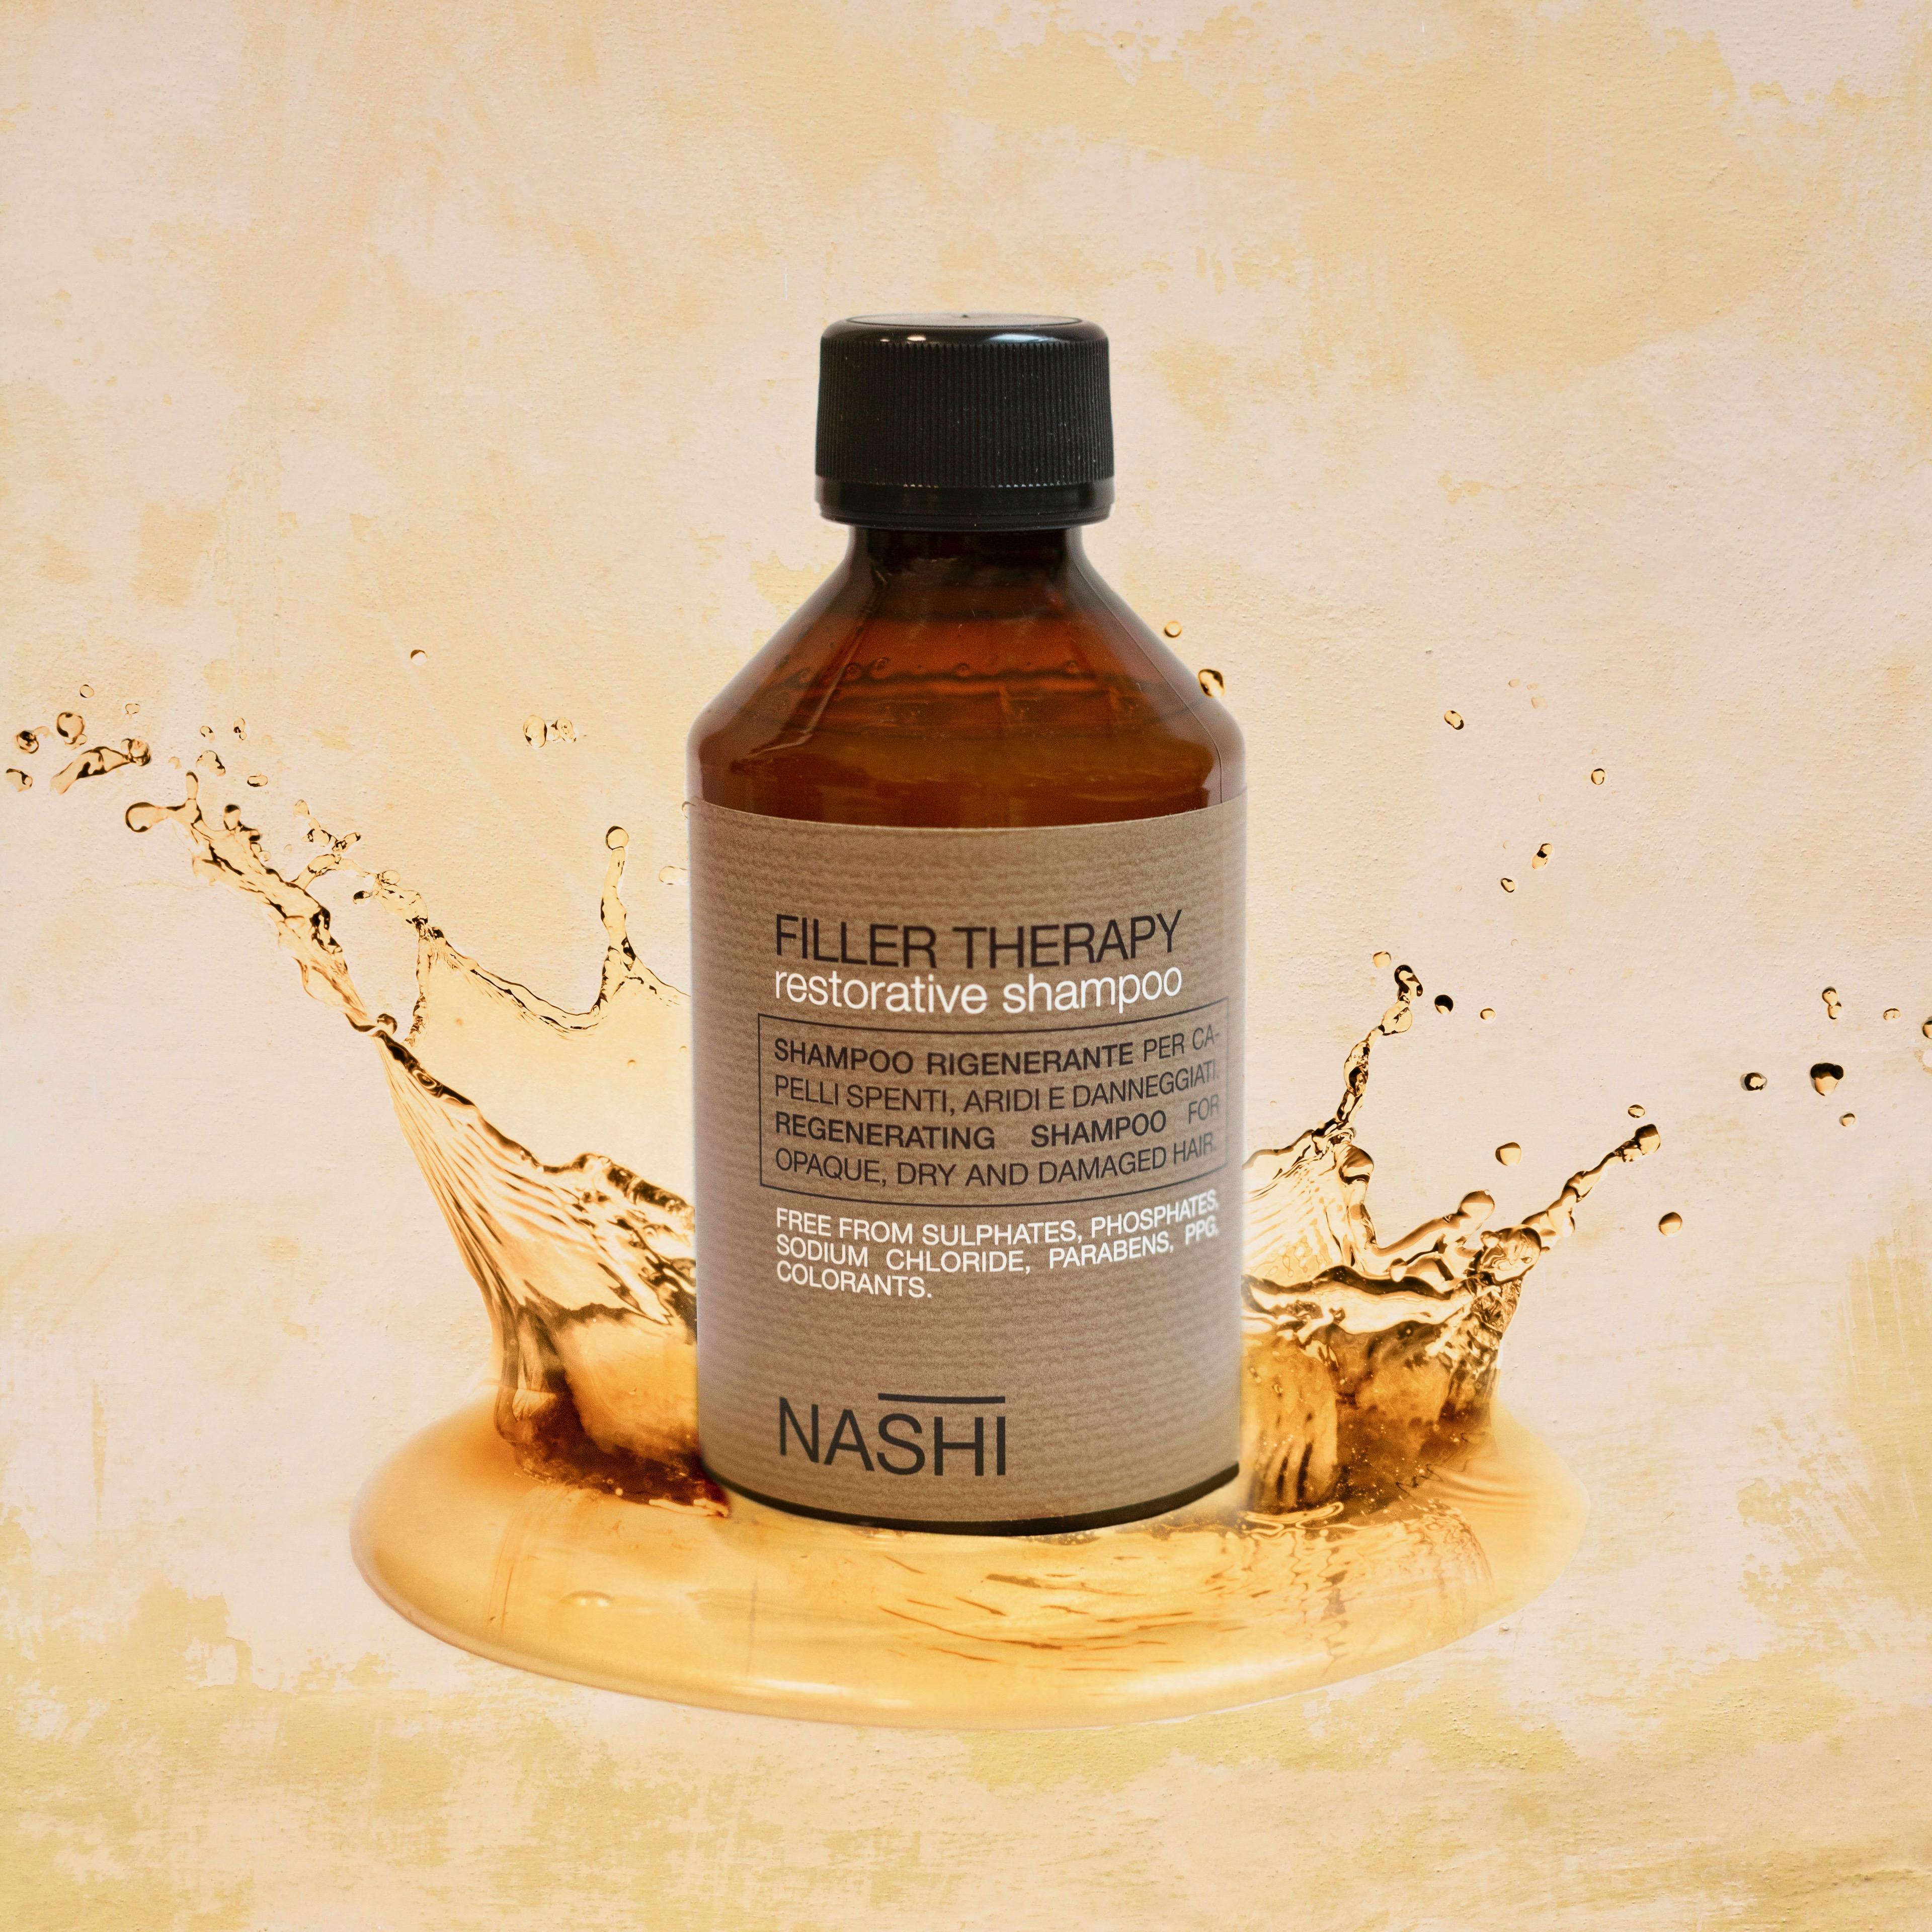 shampon nashi filler therapy